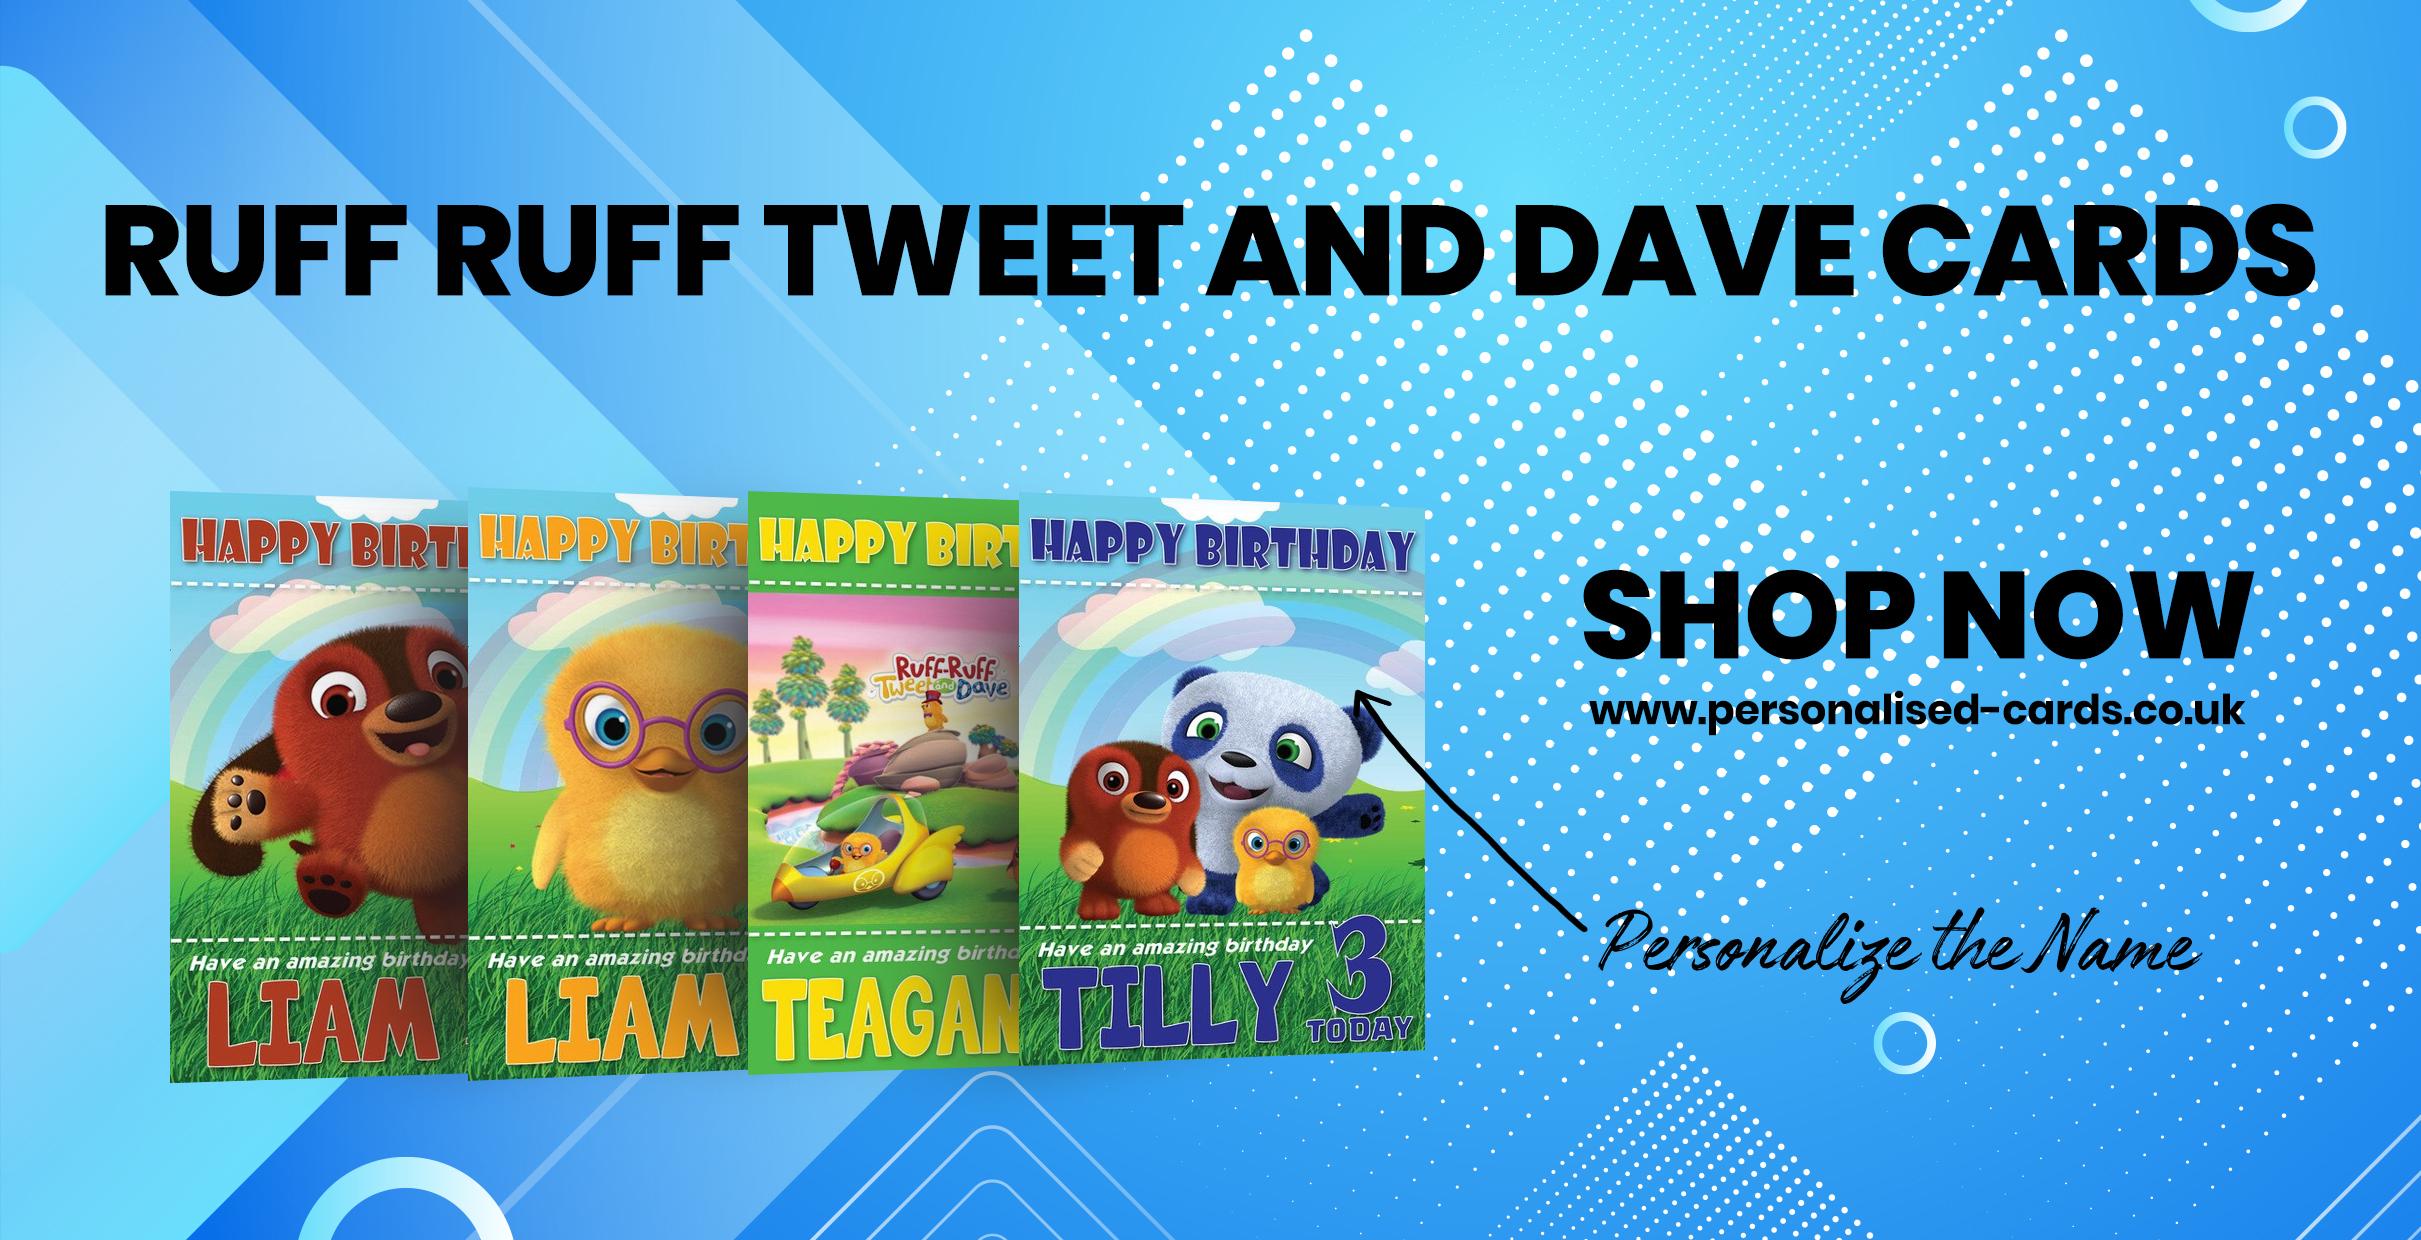 ruff-ruff-tweet-and-dave-cards.jpg